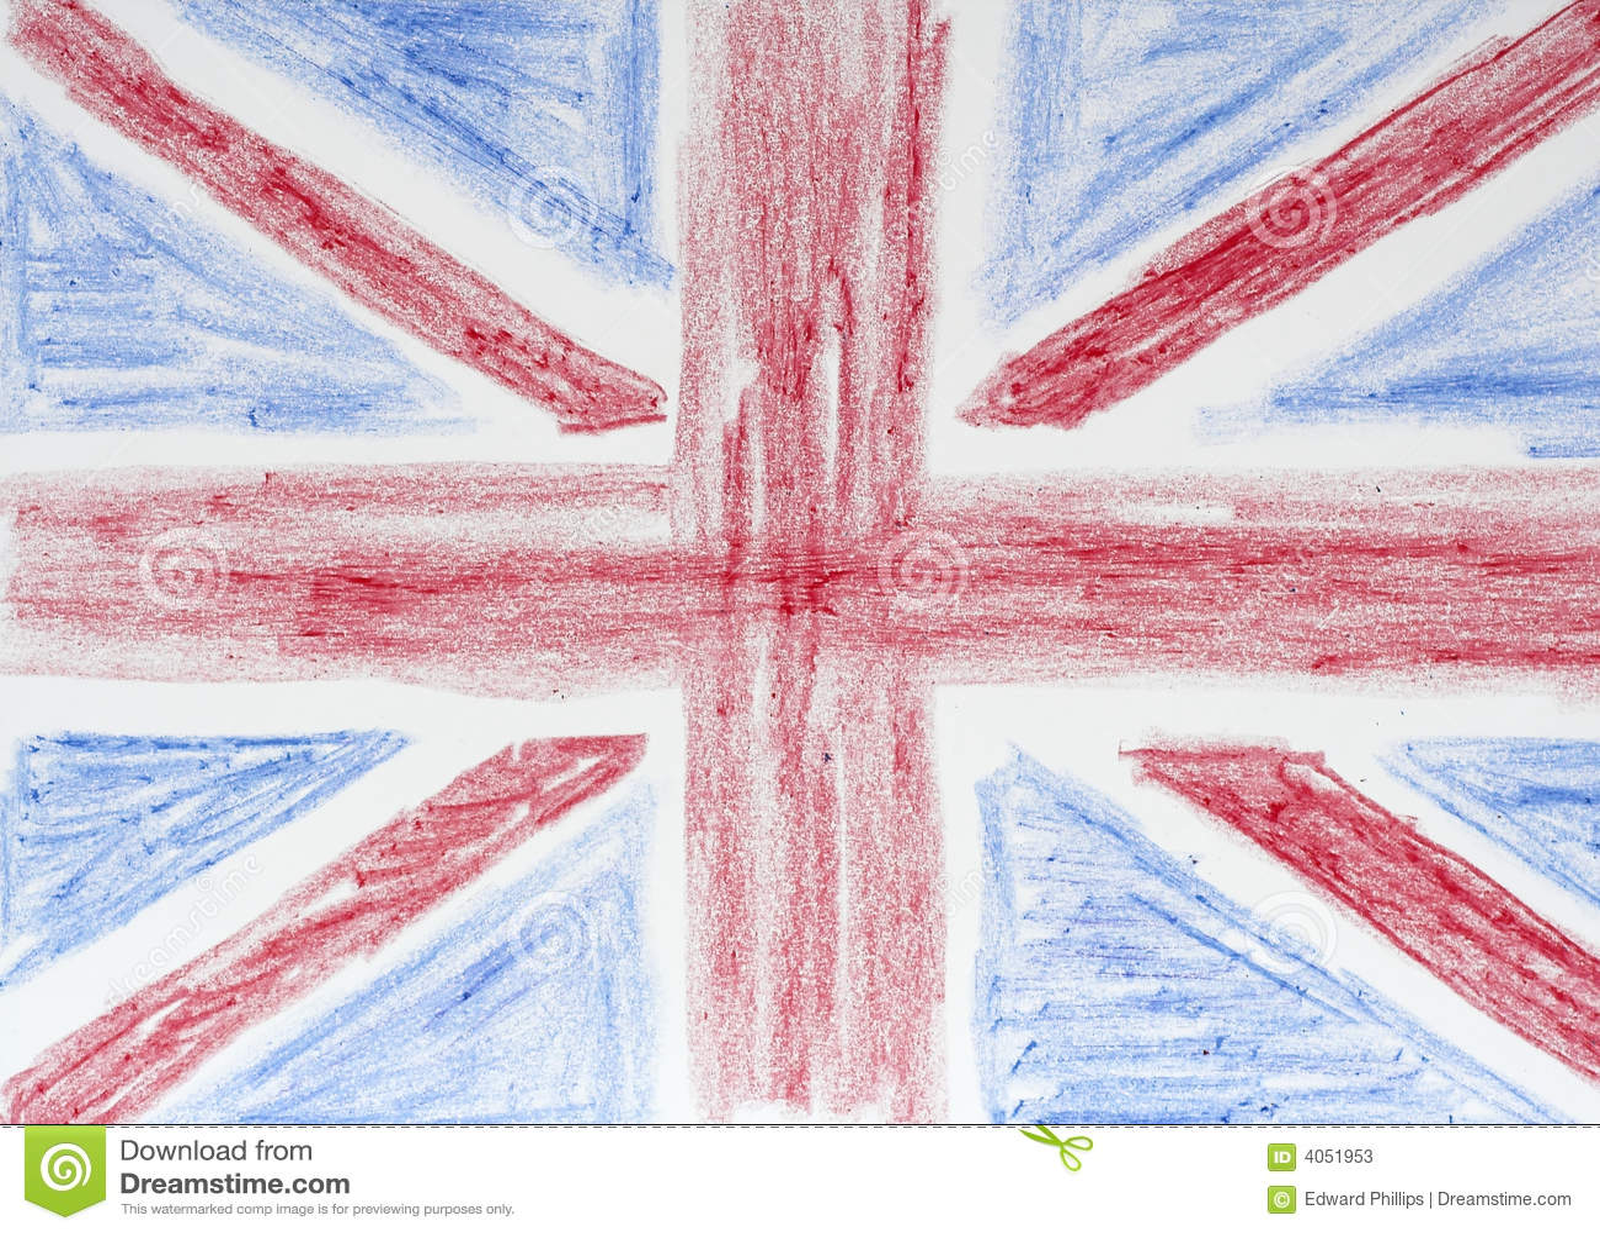 Drawing Of British Flag Stock Photos - Image: 4051953